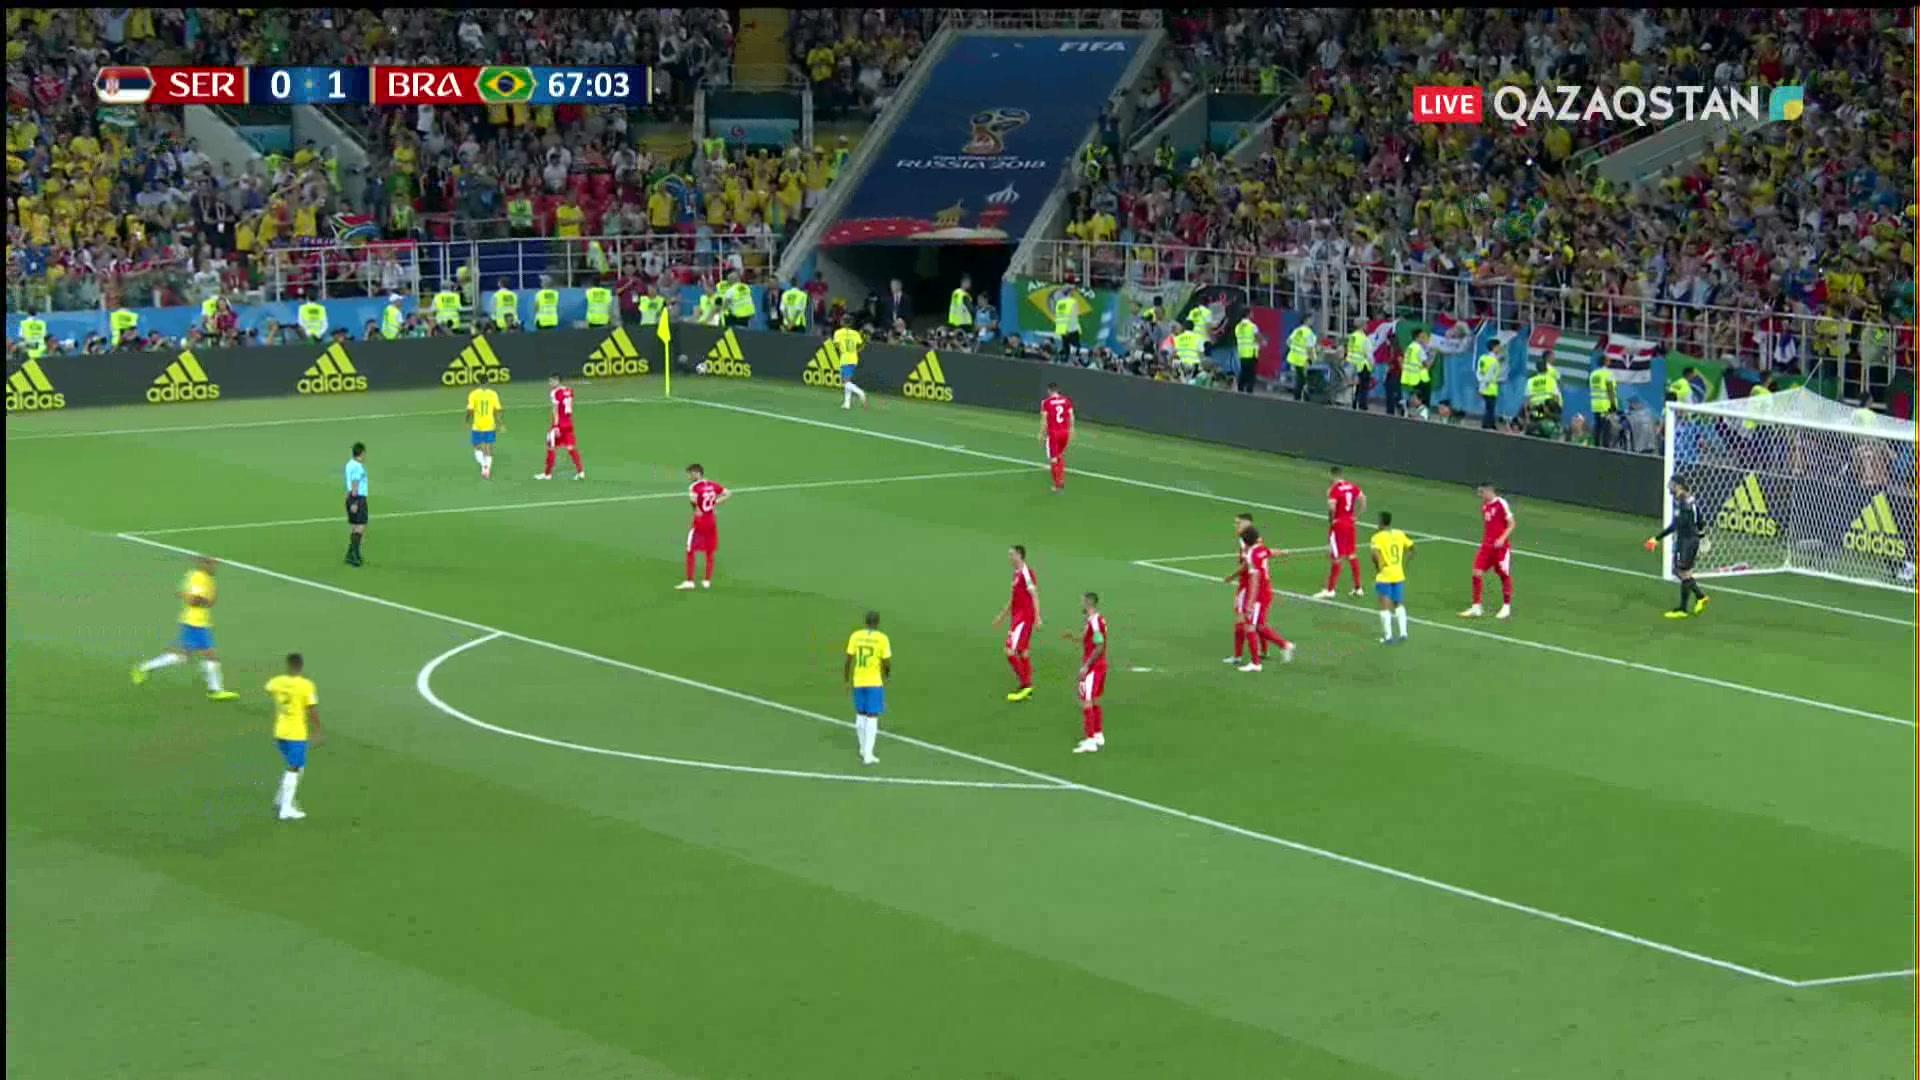 Сербия – Бразилия - 0:2 | Әлем Чемпионаты 2018